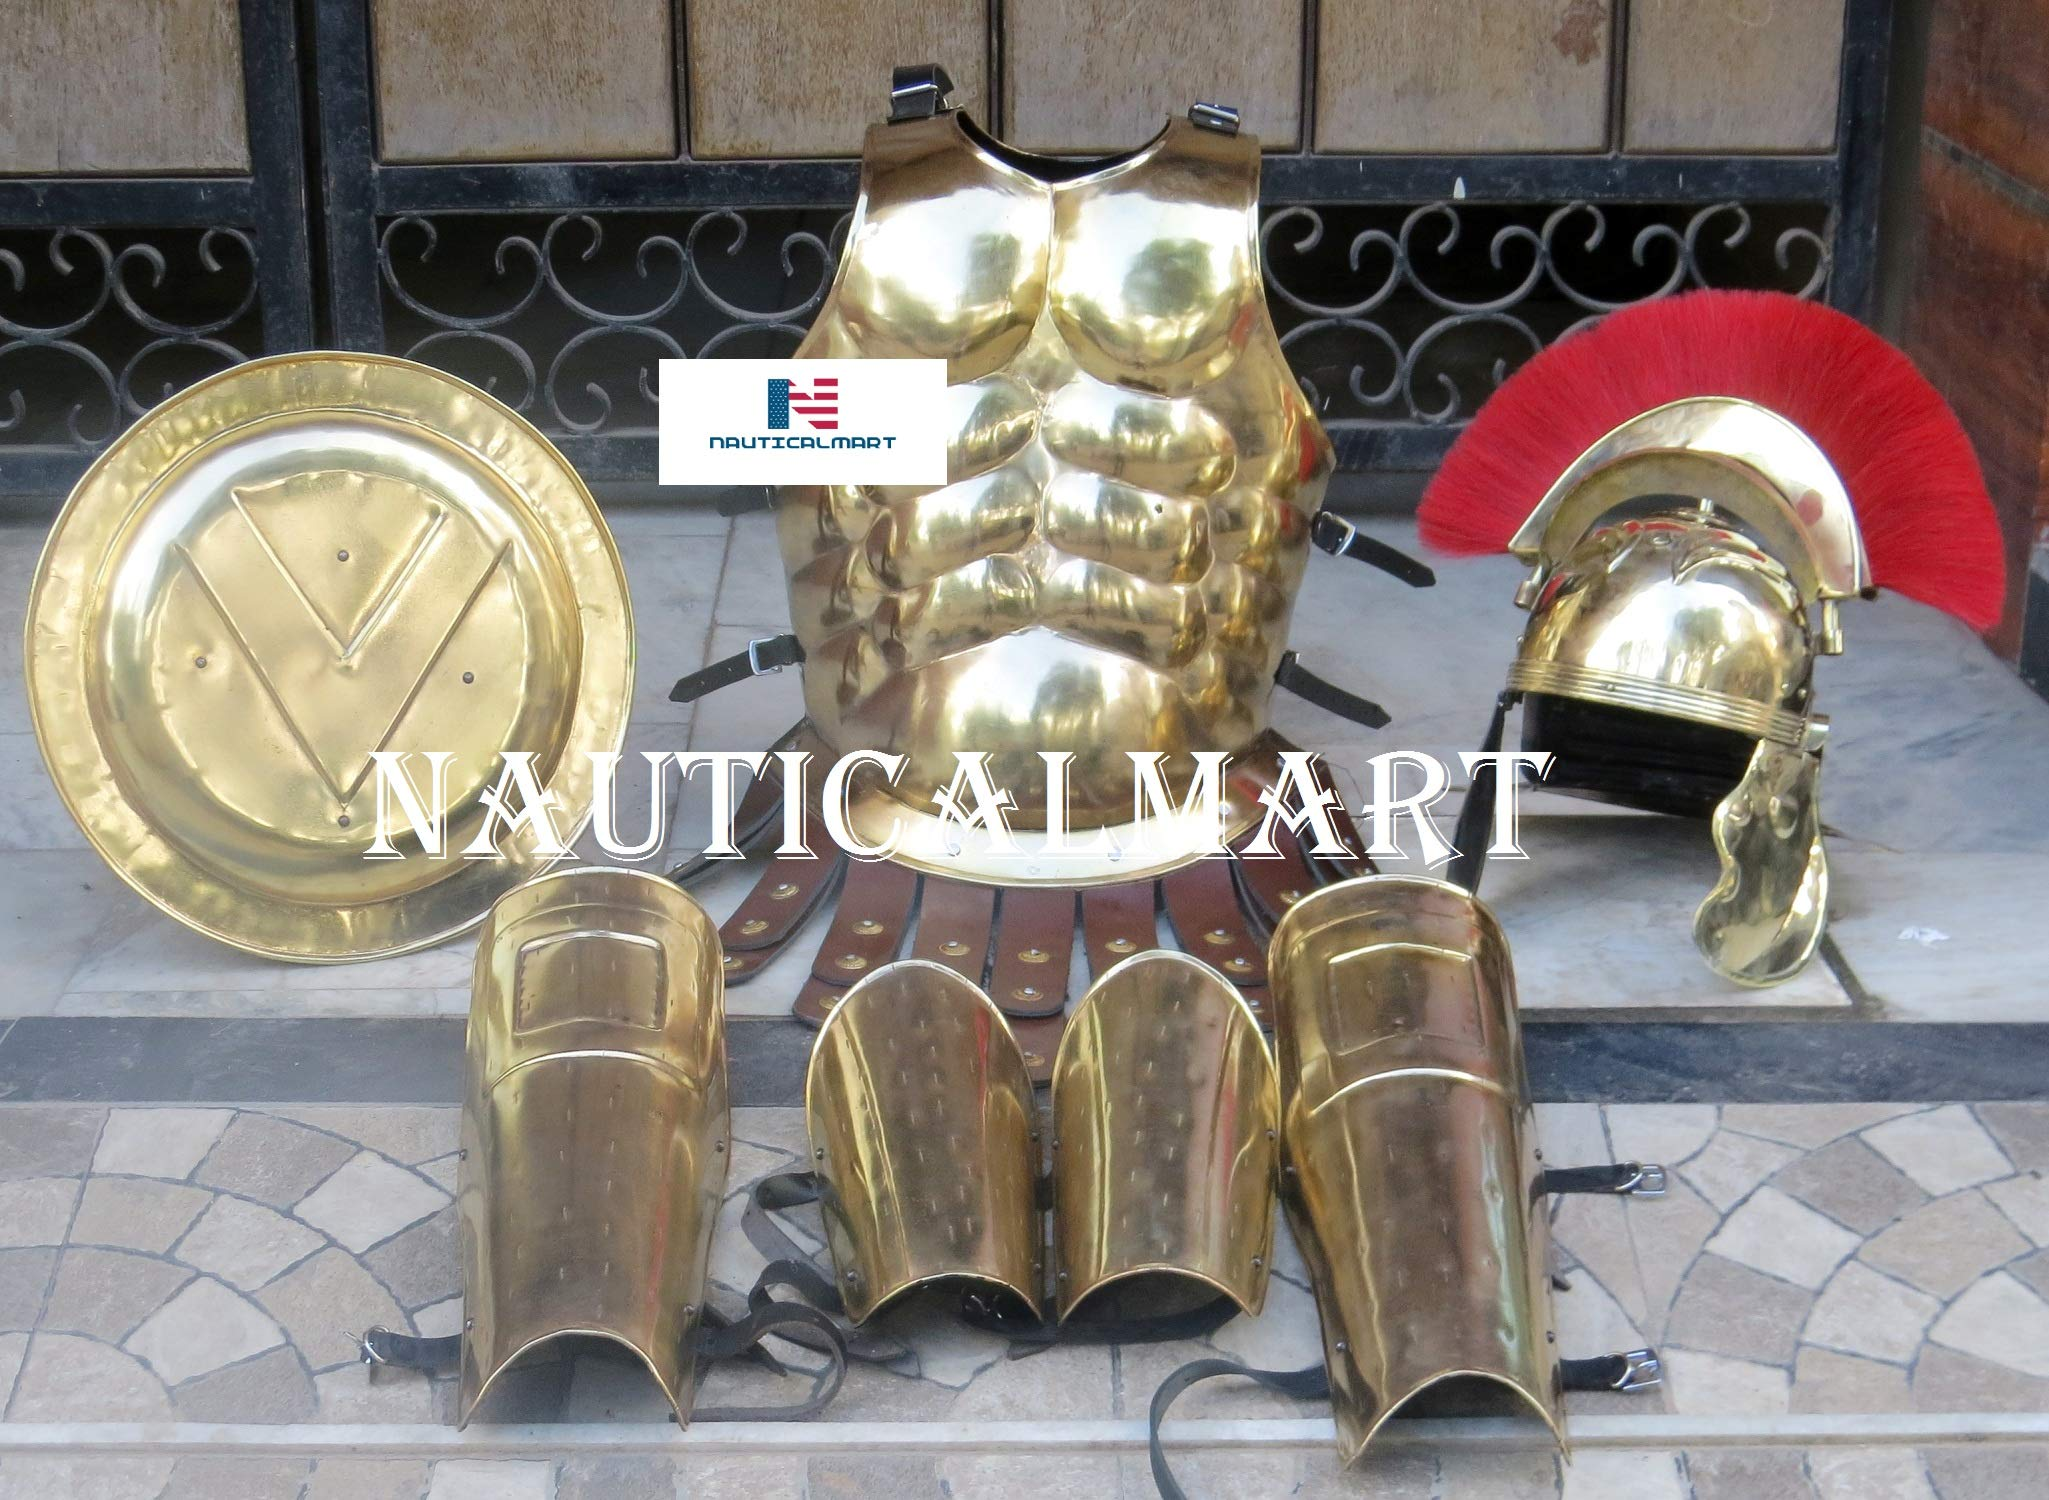 NauticalMart Roman Muscle Body Armor Set Functional Medieval Cuirass with Brass Centurion Helmet, Leg & Arm Guard, Shield Halloween Outfit Brass by NauticalMart